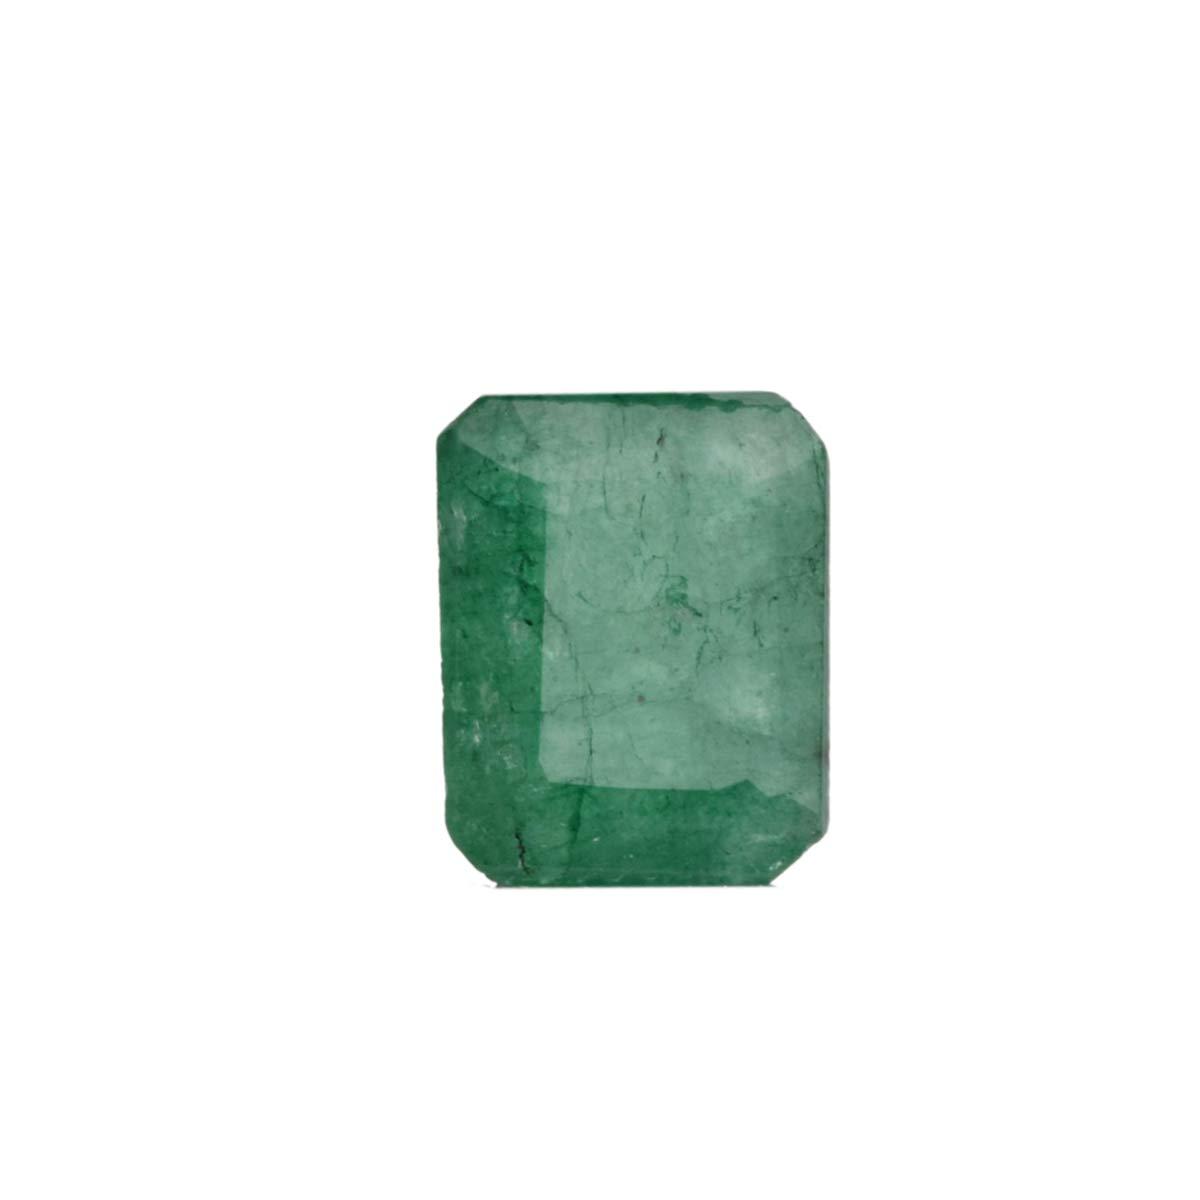 Genuine Green Emerald 4.50 Ct Egl Certified Green Emerald, Shiny Emerald, Emerald Shape Green Emerald Loose Gemstone hamlet e commerce V-5346